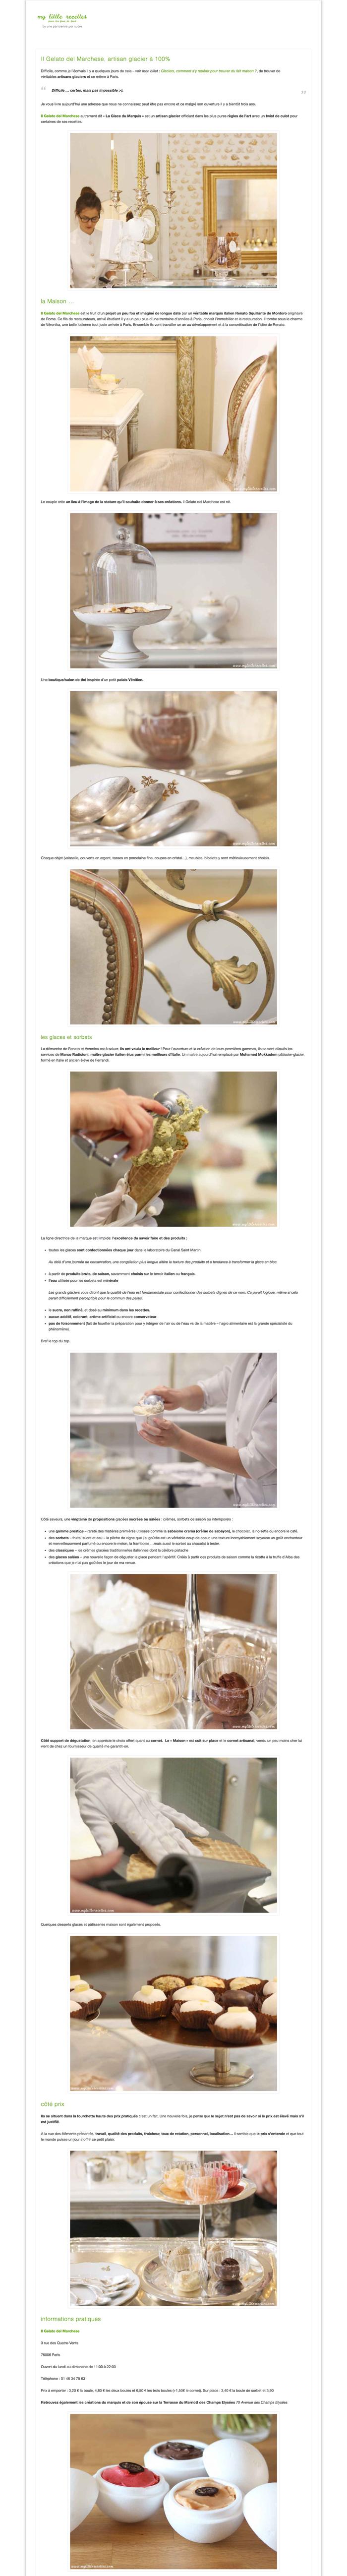 screencapture-mylittlerecettes-gelato-del-marchese-artisan-glacier-a-100-1498594511175